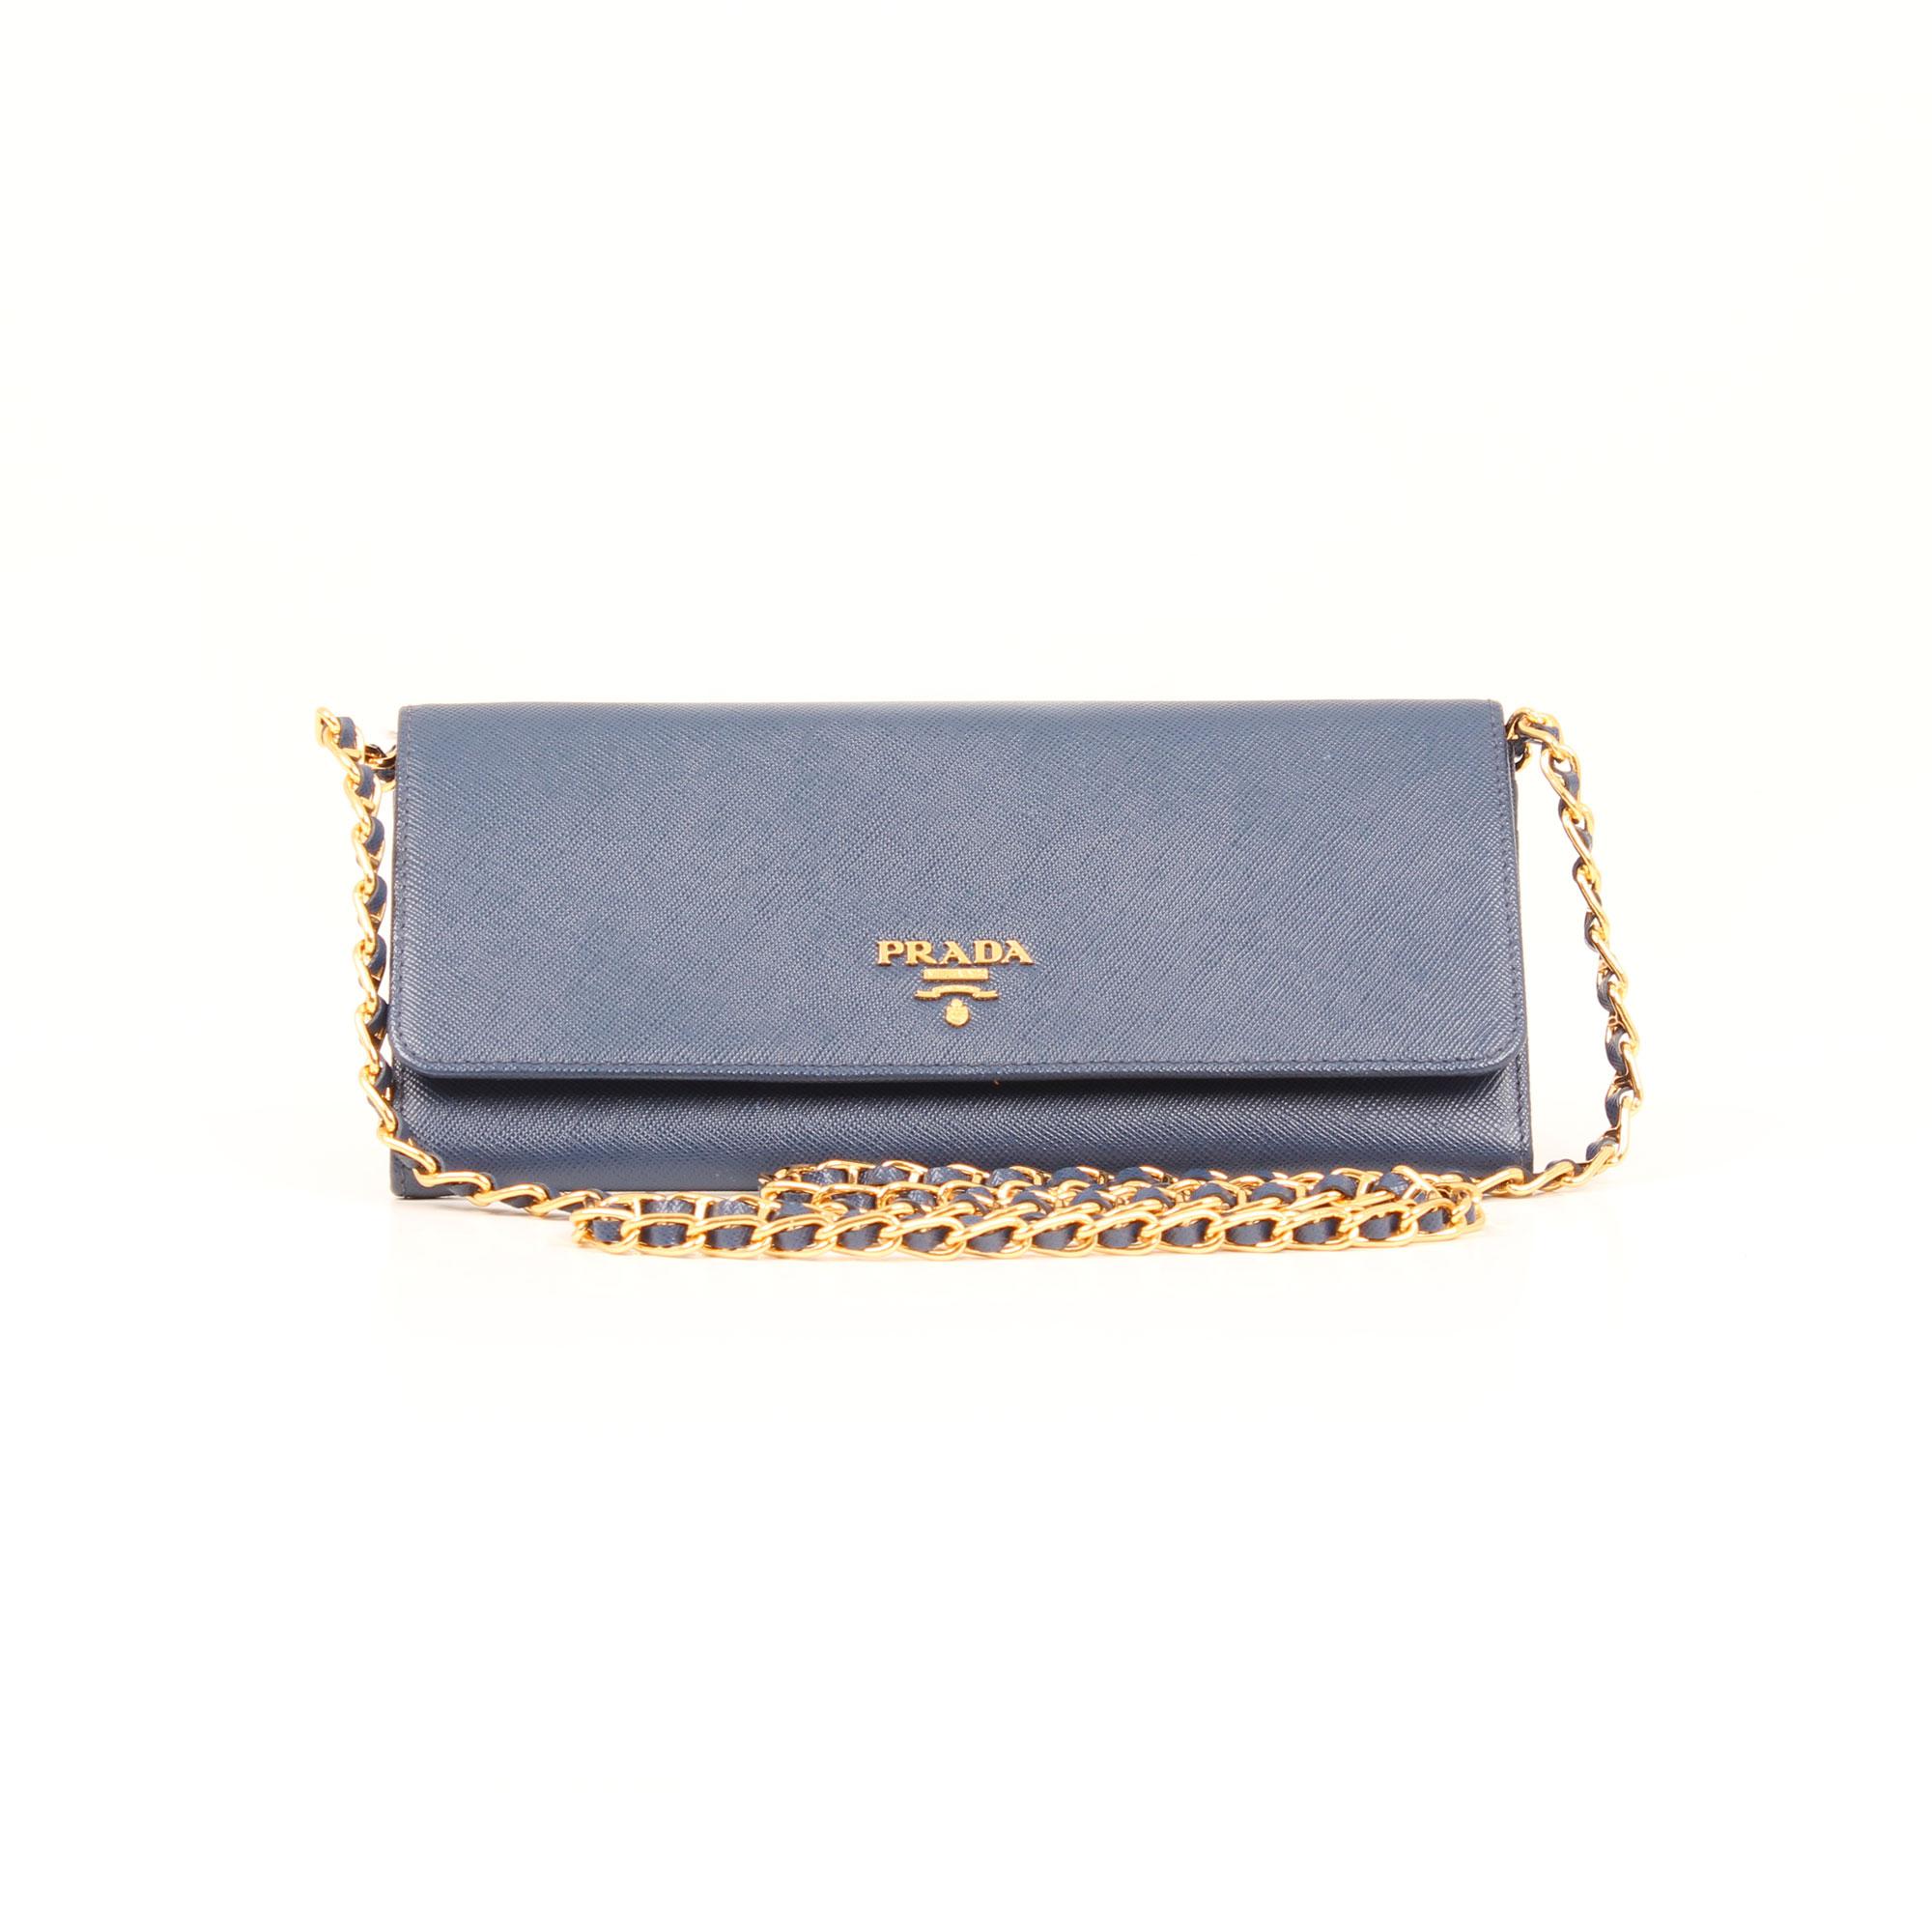 bag-prada-wallet-on-chain-saffiano-metal-bluette-blue-front